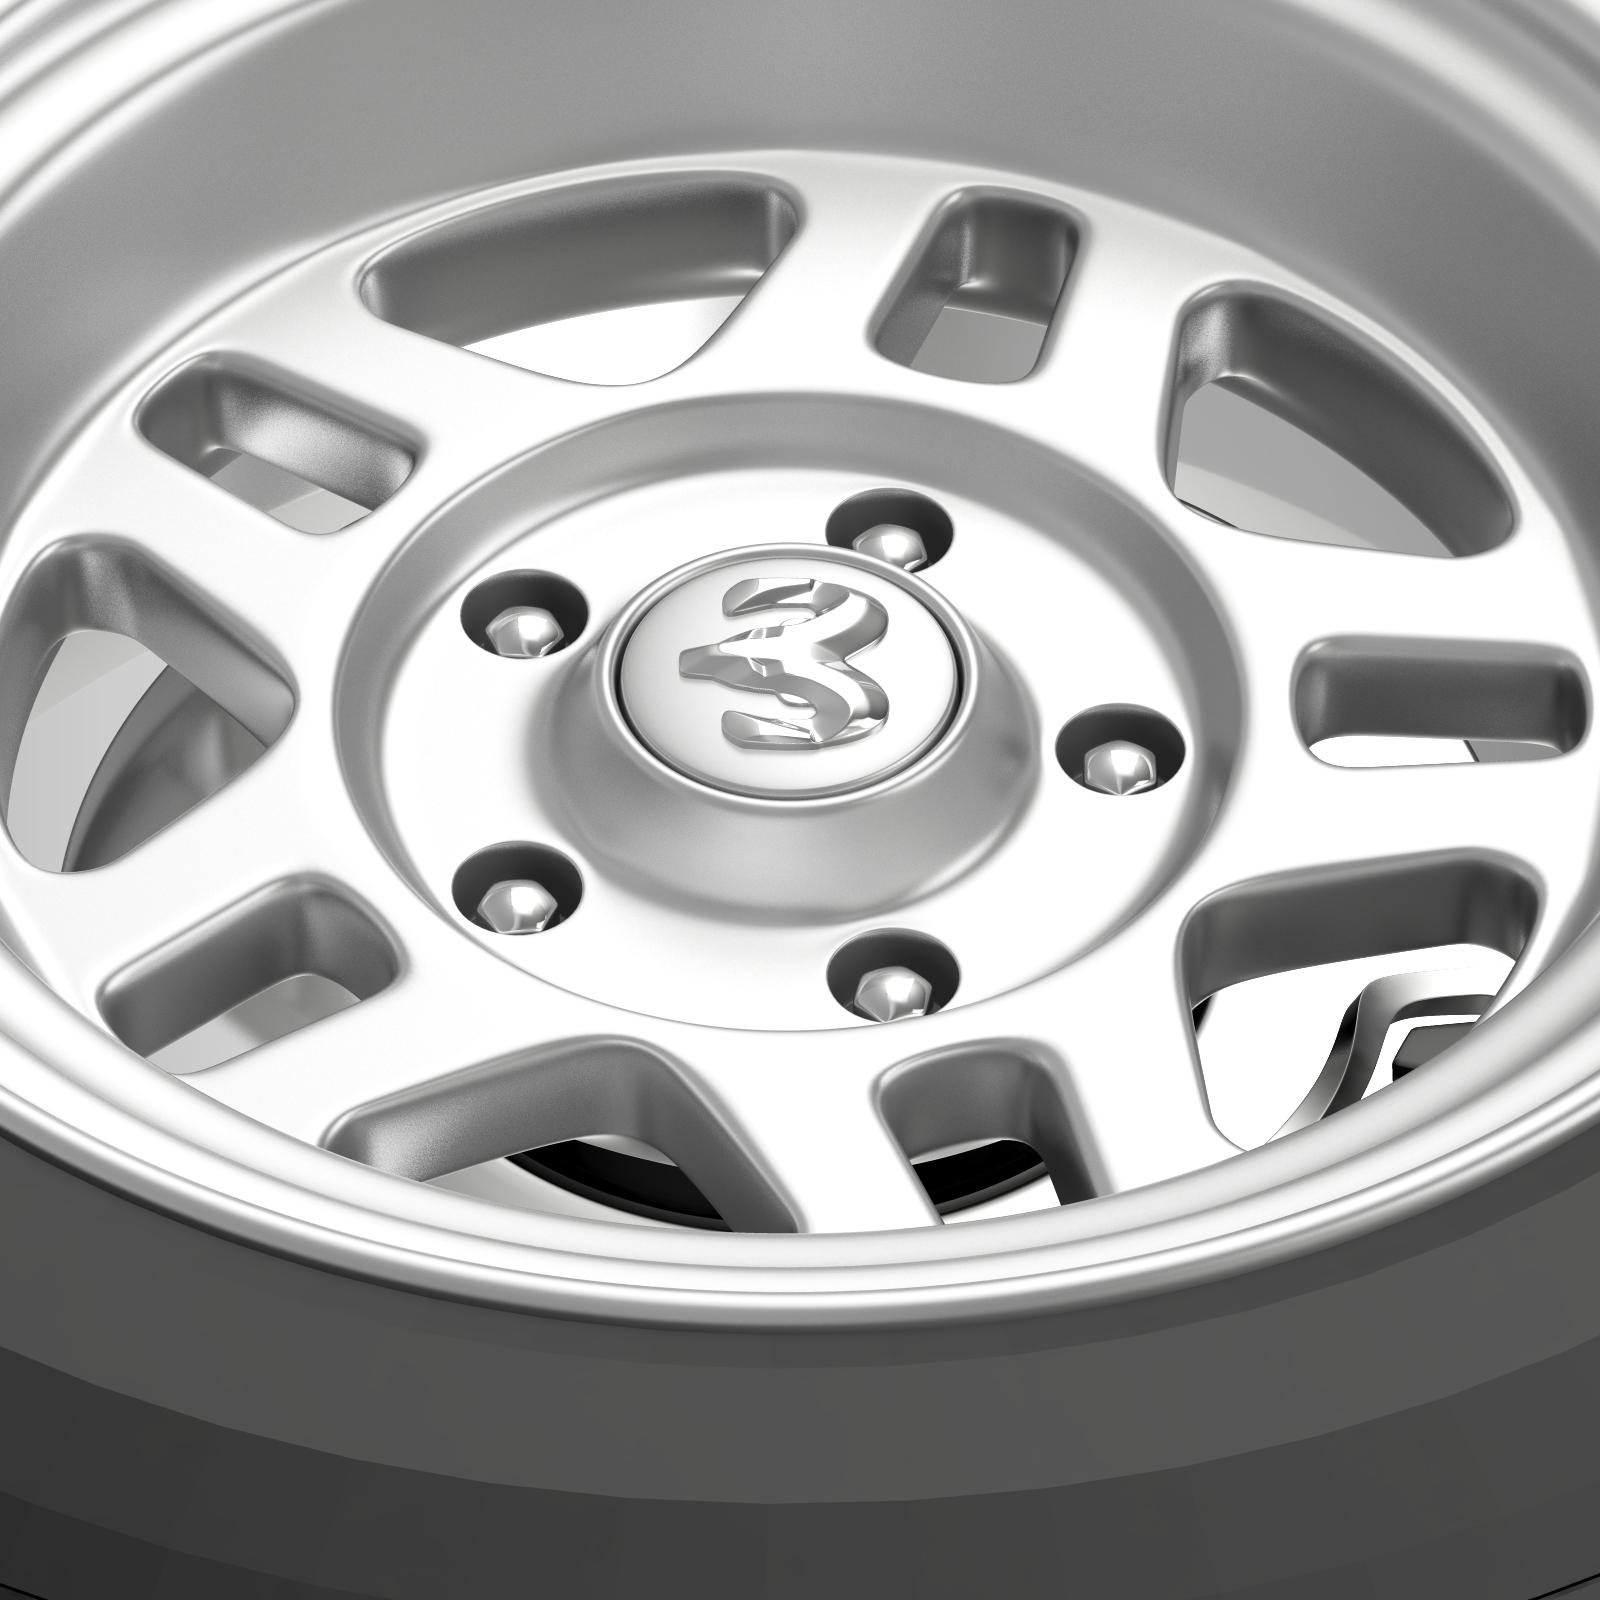 dodge challenger mopar wheel 3d model 3ds max fbx c4d lwo ma mb hrc xsi obj 212810